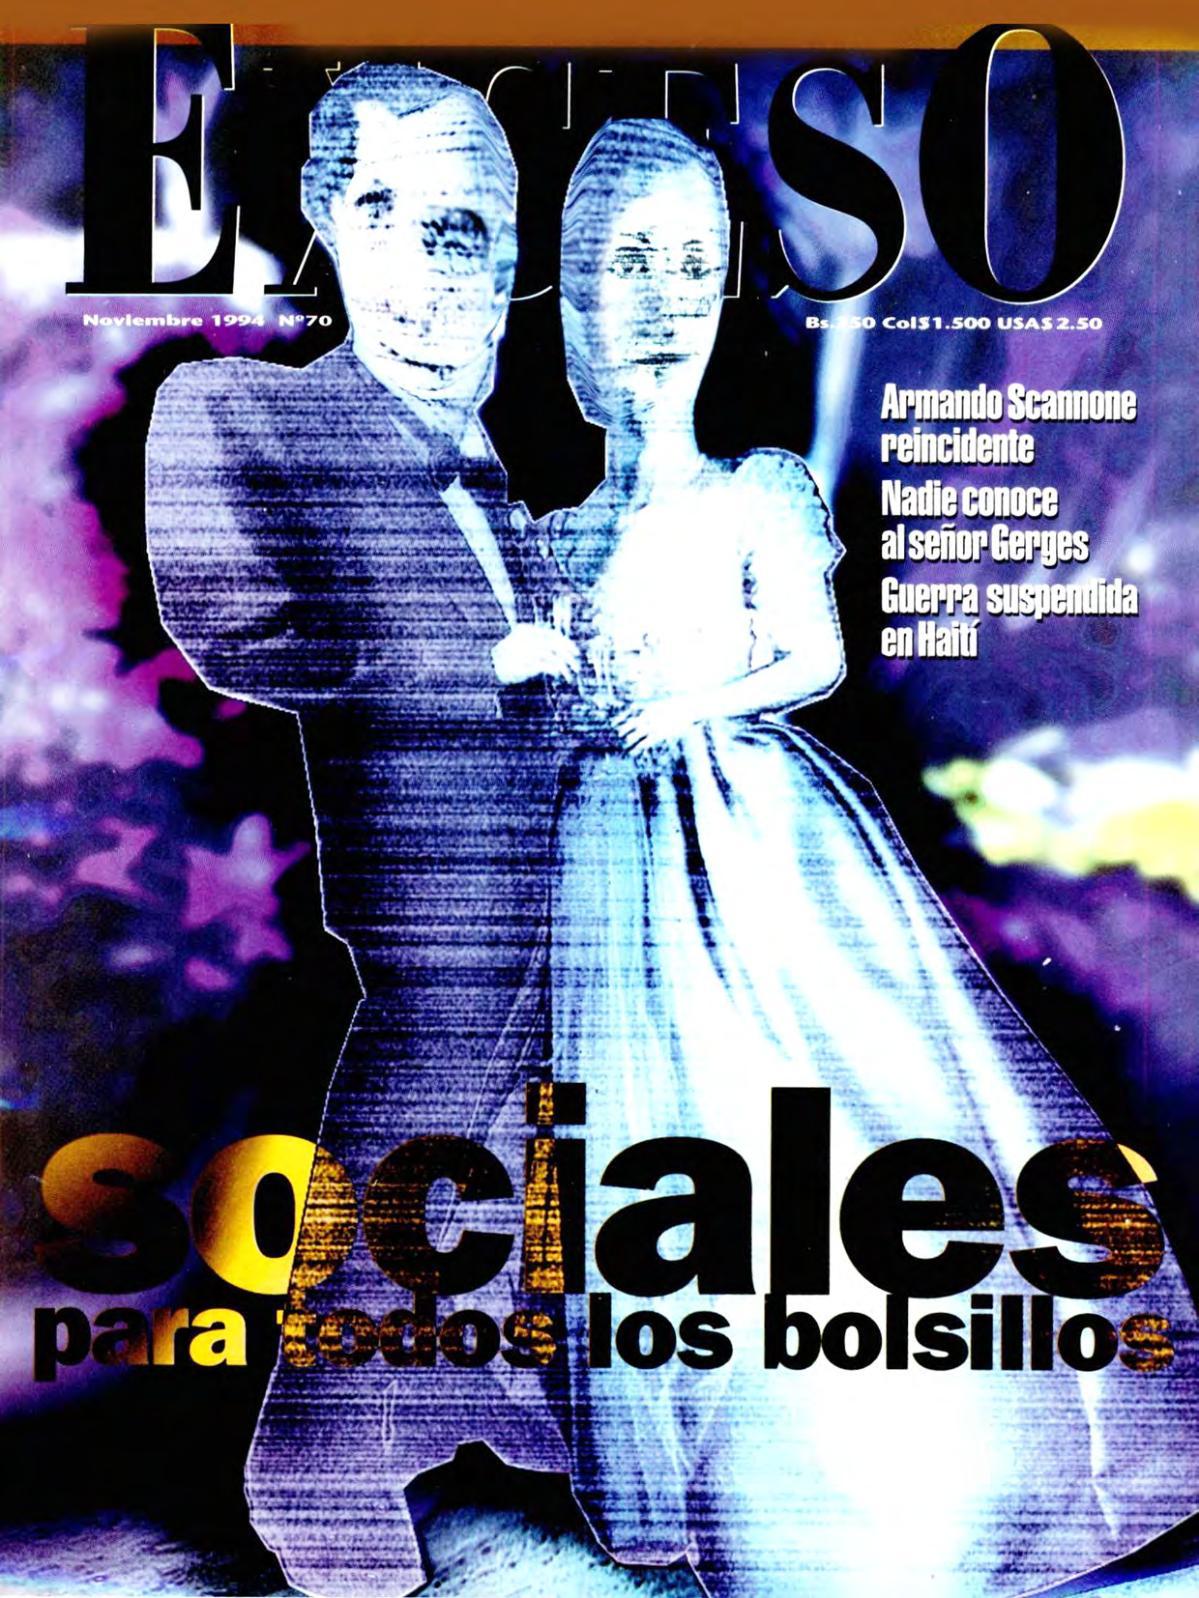 6e0c51c4bce44 Calaméo - REVISTA EXCESO EDICION Nº 70 NOVIEMBRE 1994